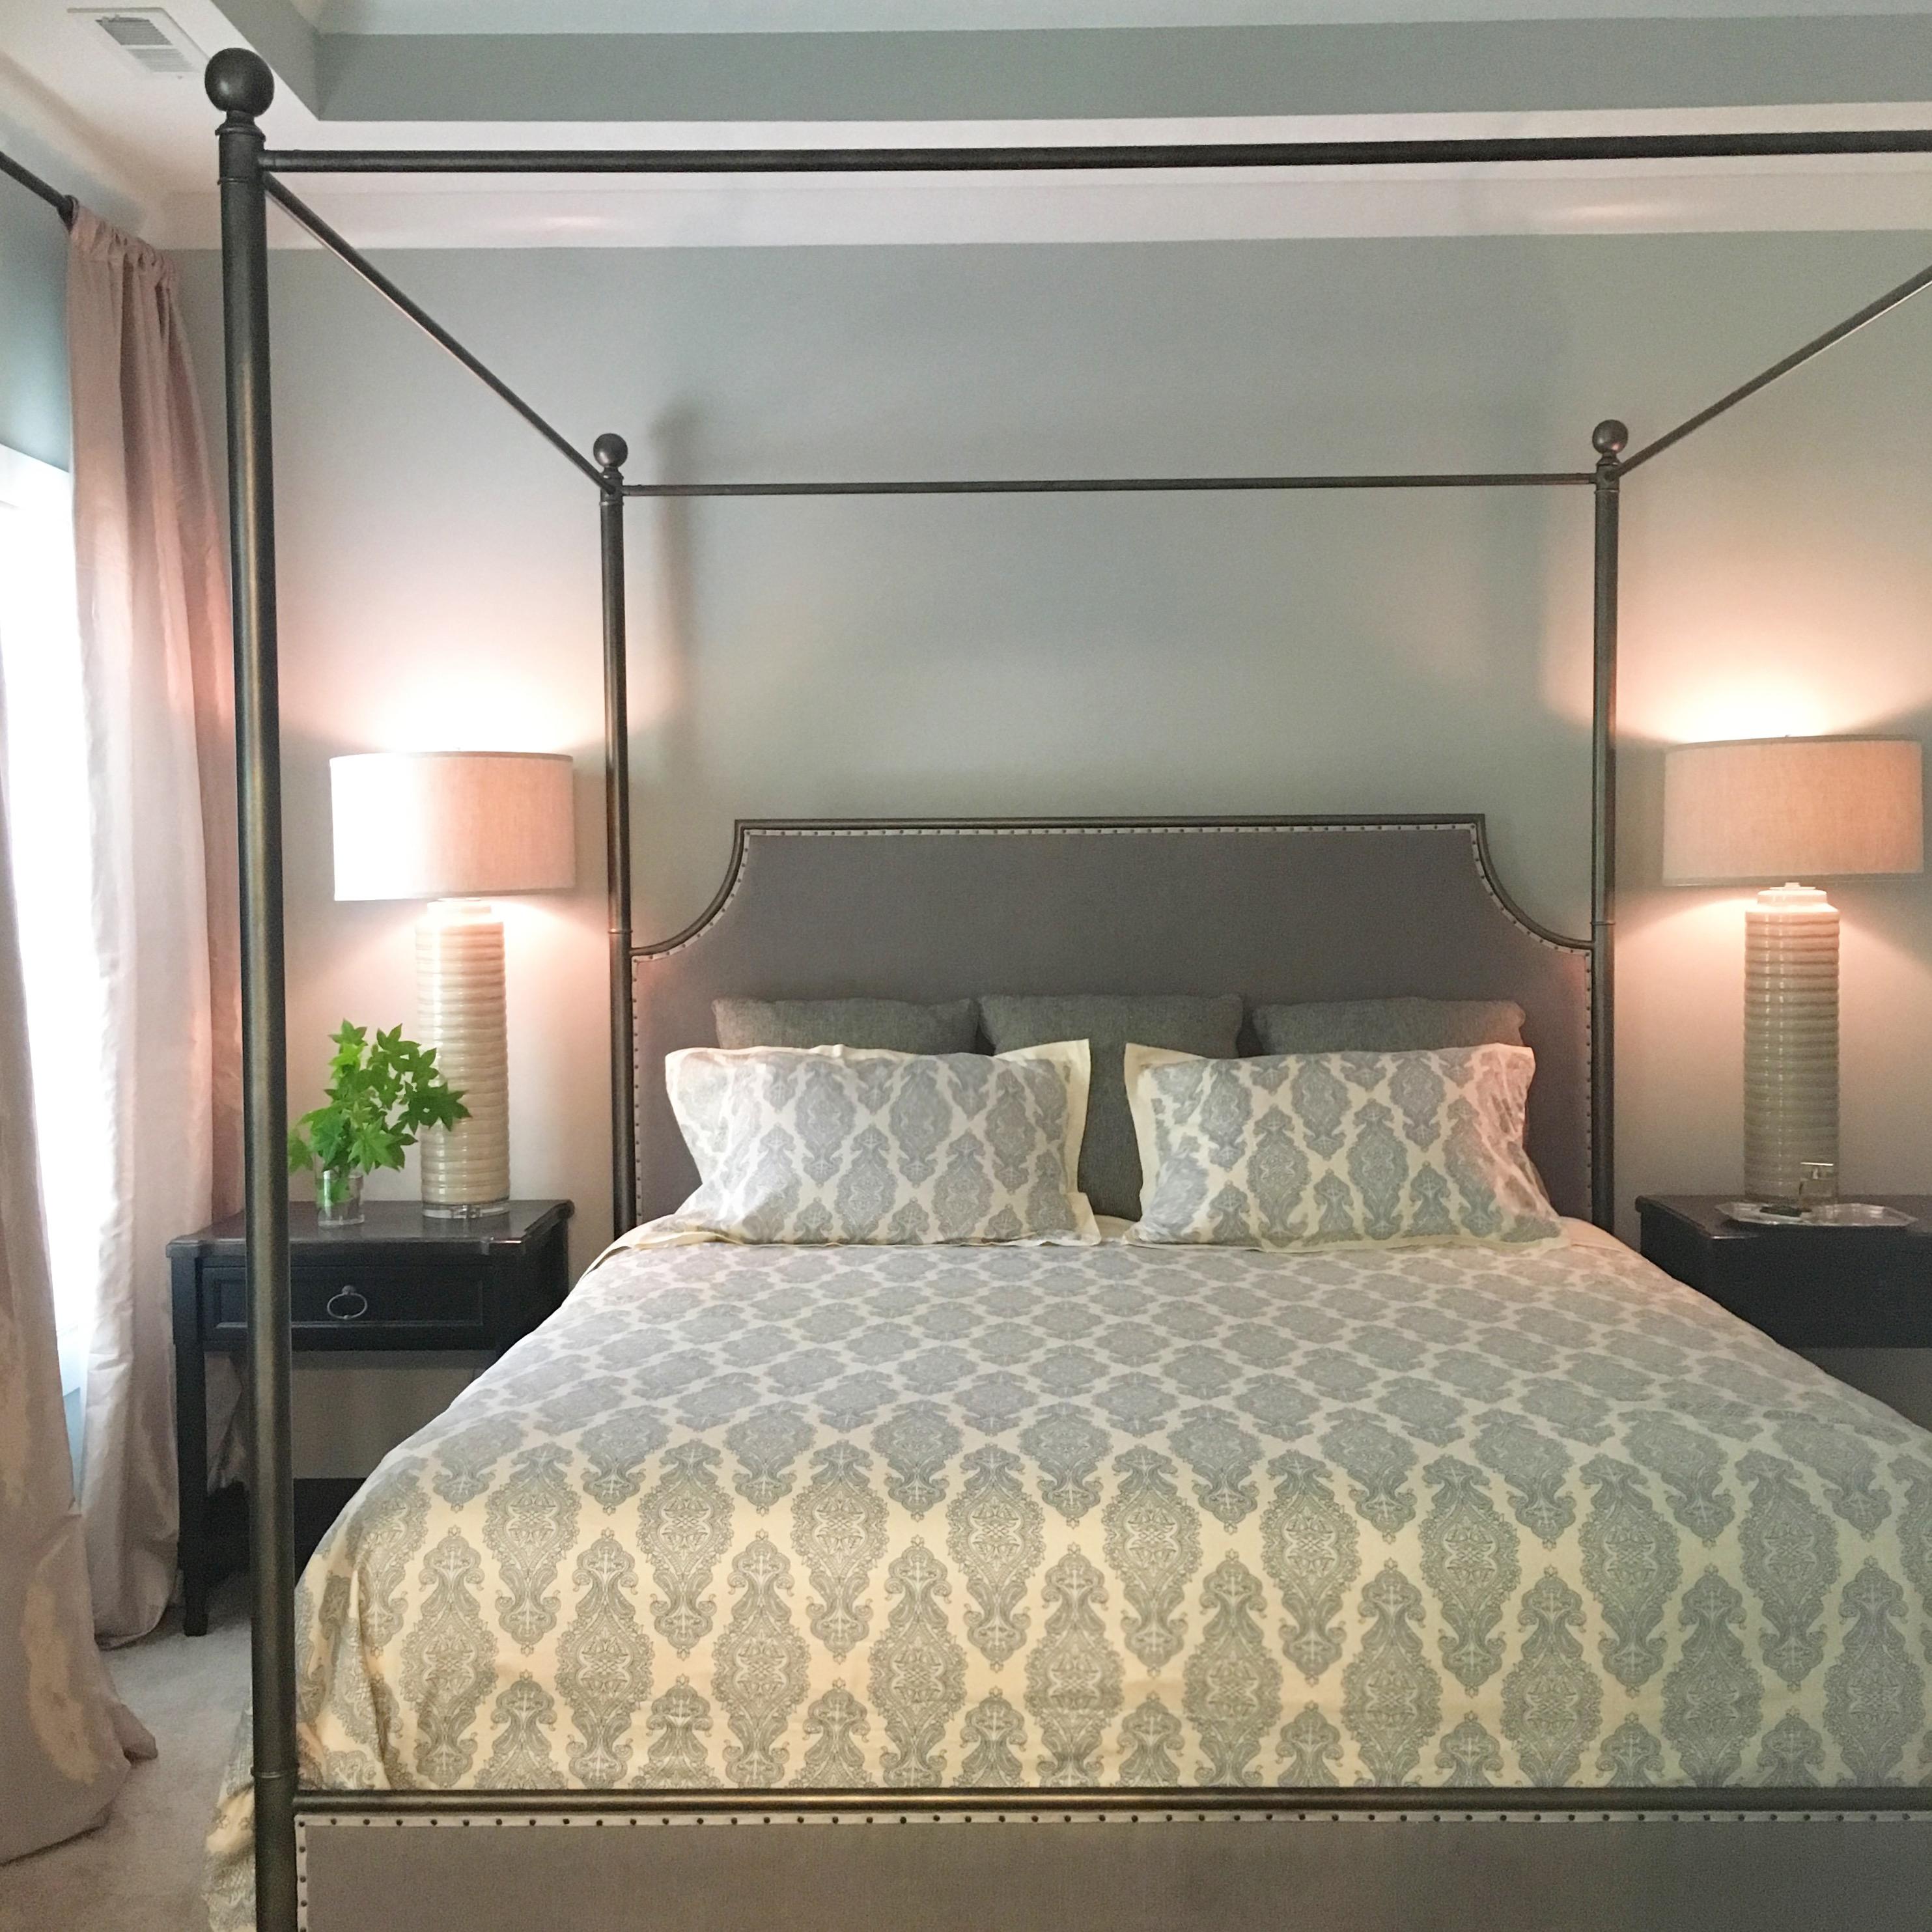 Master bedroom dsign